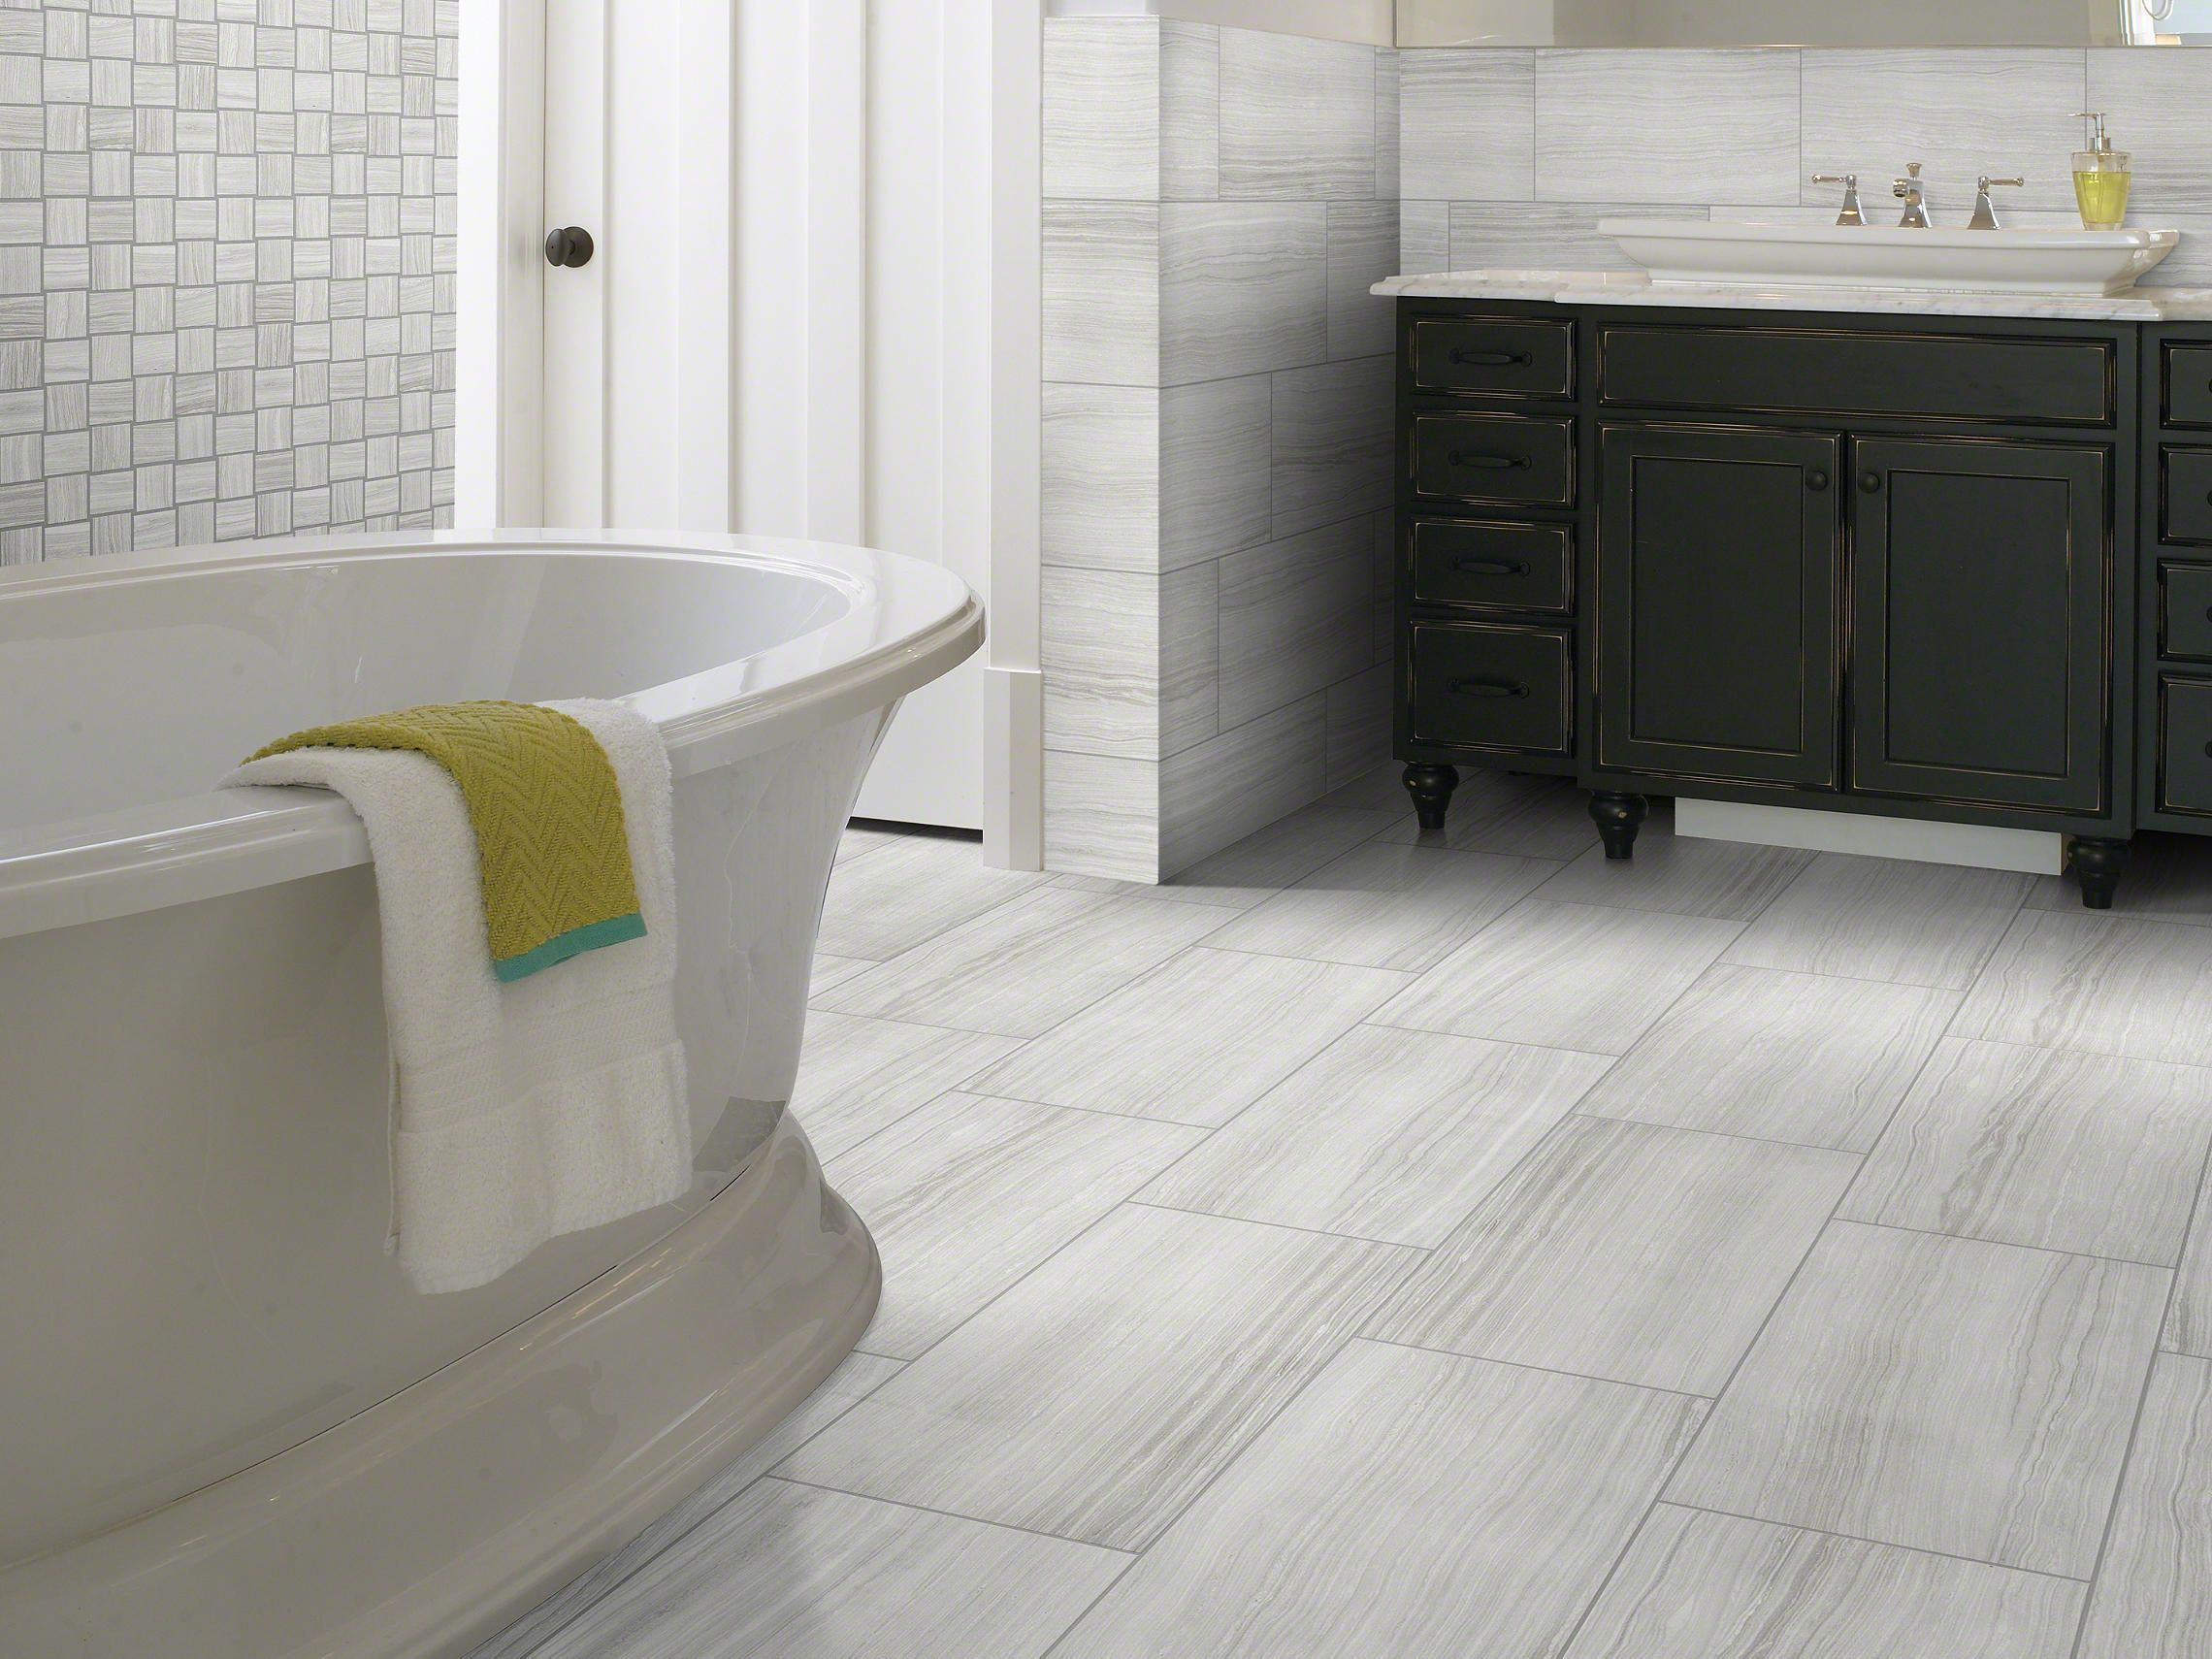 Rockwood Bn Cs55l Glacier Tile And Stone Wall And Flooring Tiles Tile Floor Floor Tile Design Tile Bathroom